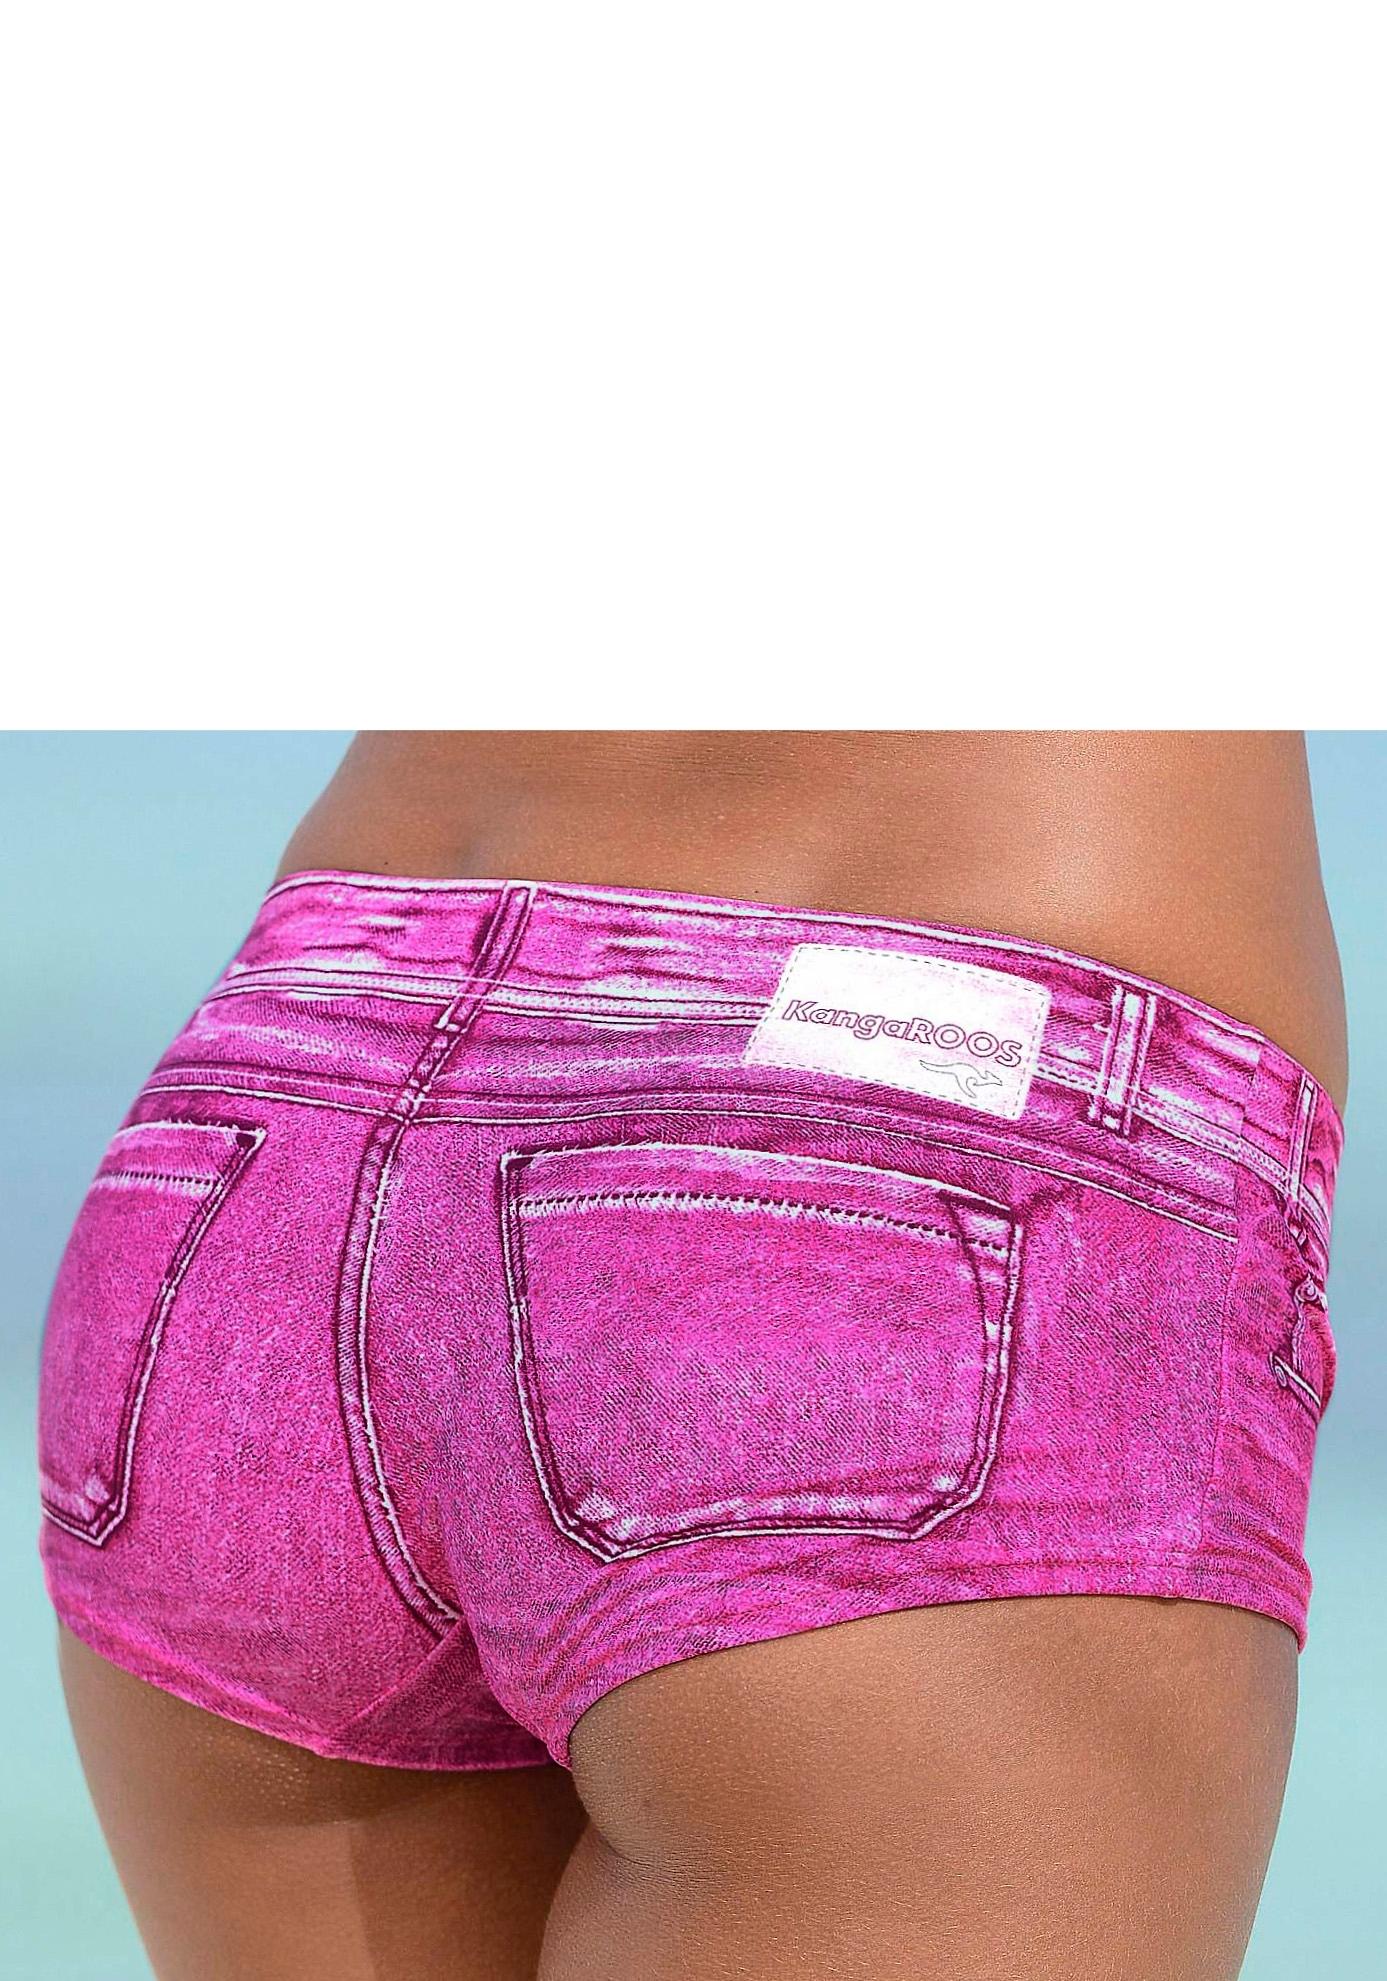 KangaROOS Hotpants online kopen op lascana.nl